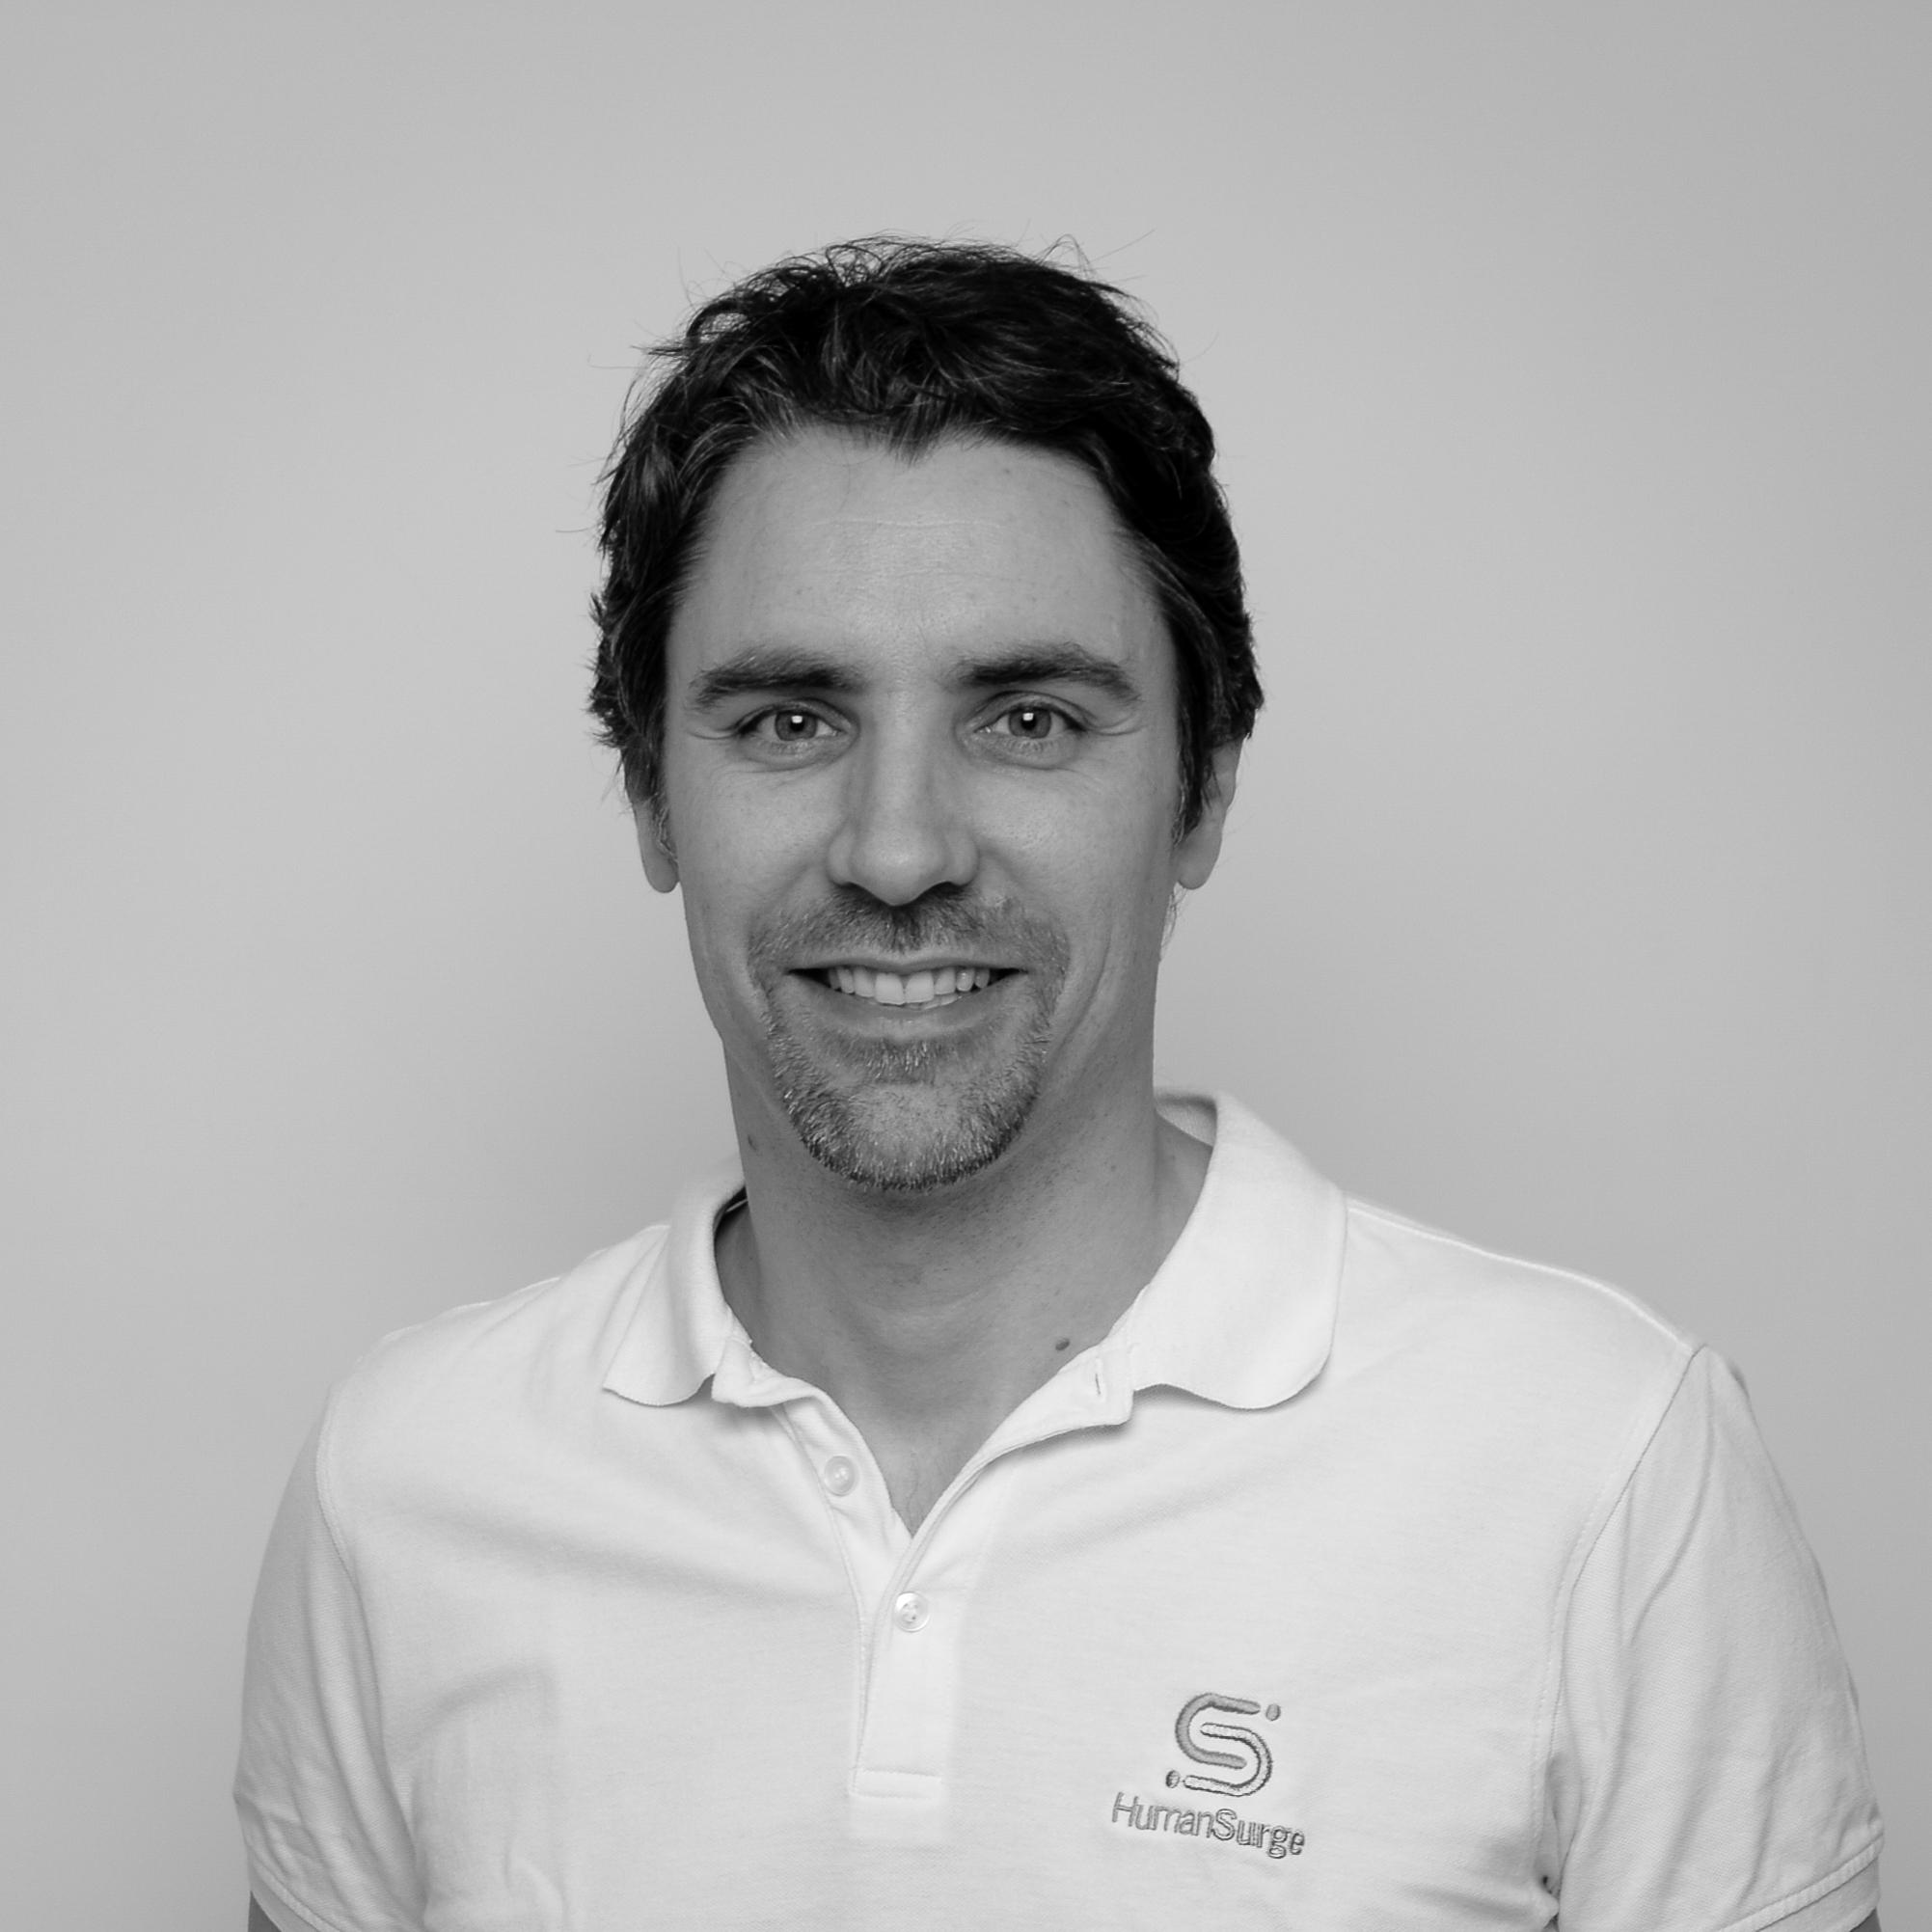 Loek Peeters, CEO and Co-Founder HumanSurge